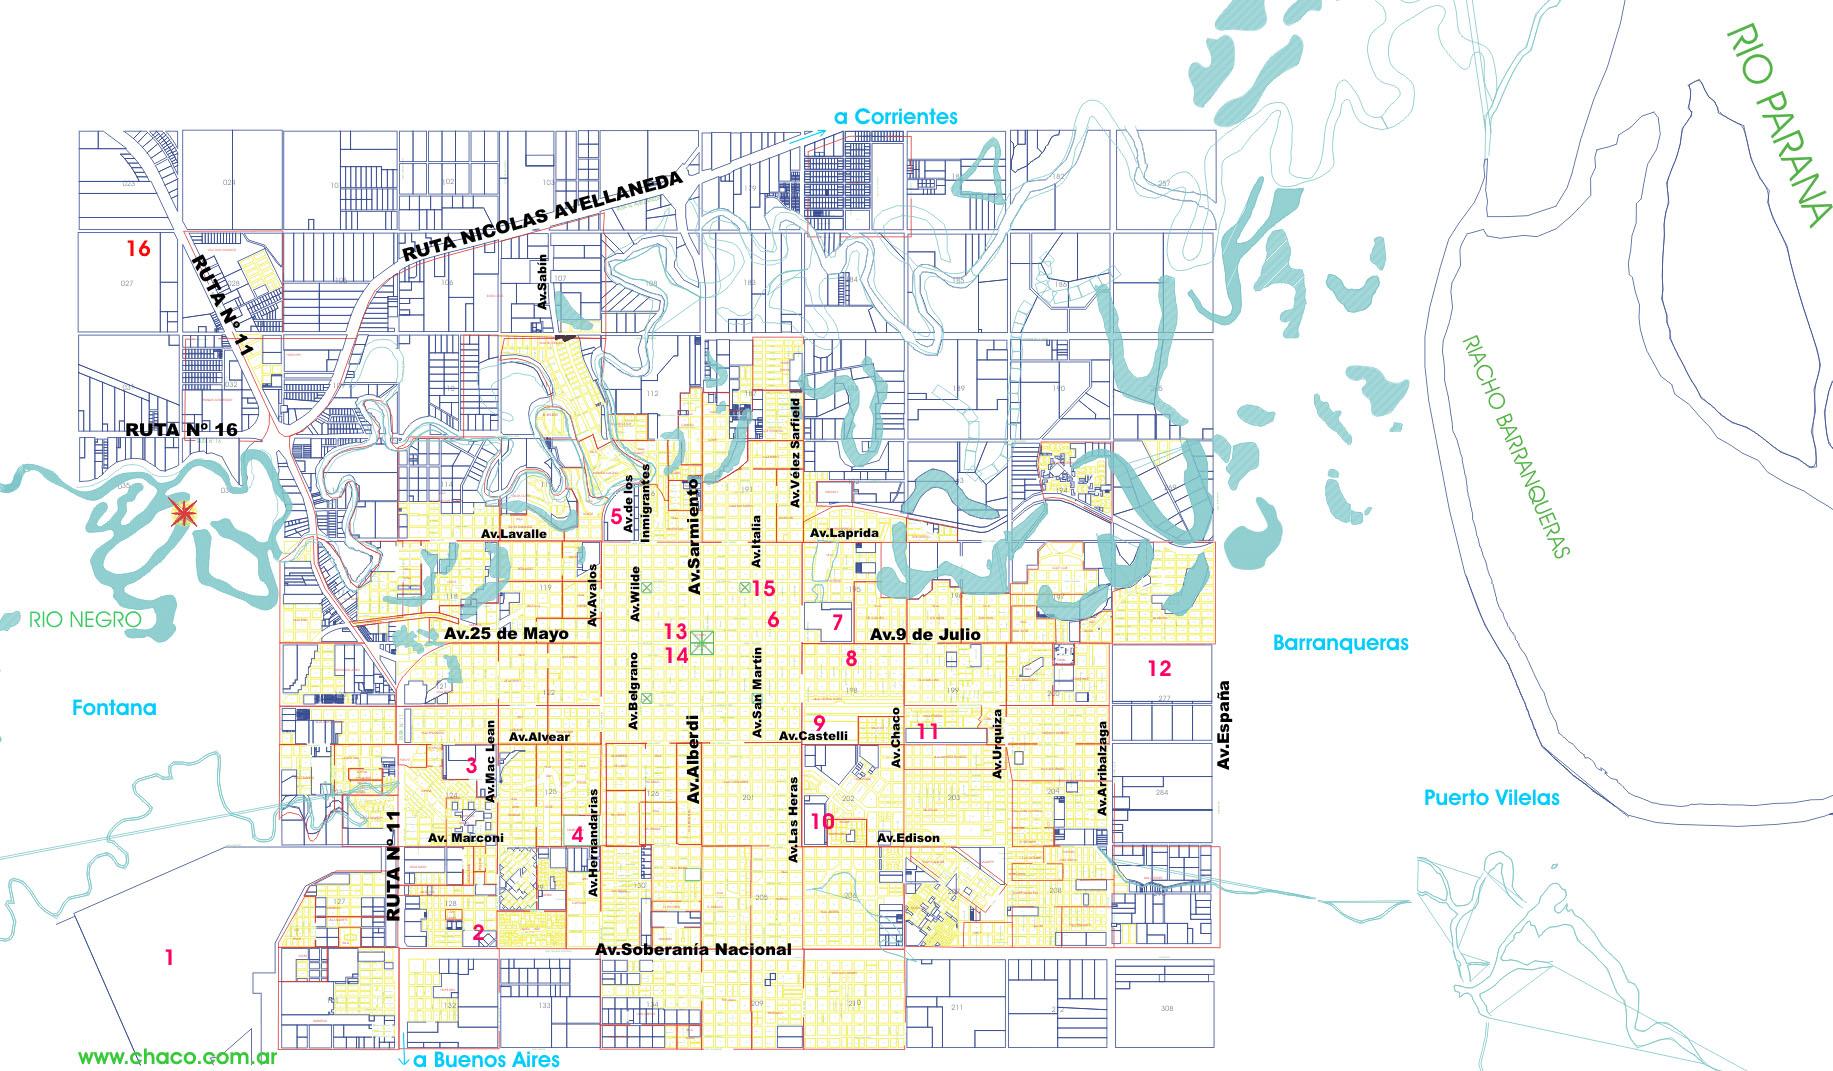 Resistencia City Map, Chaco Prov., Argentina